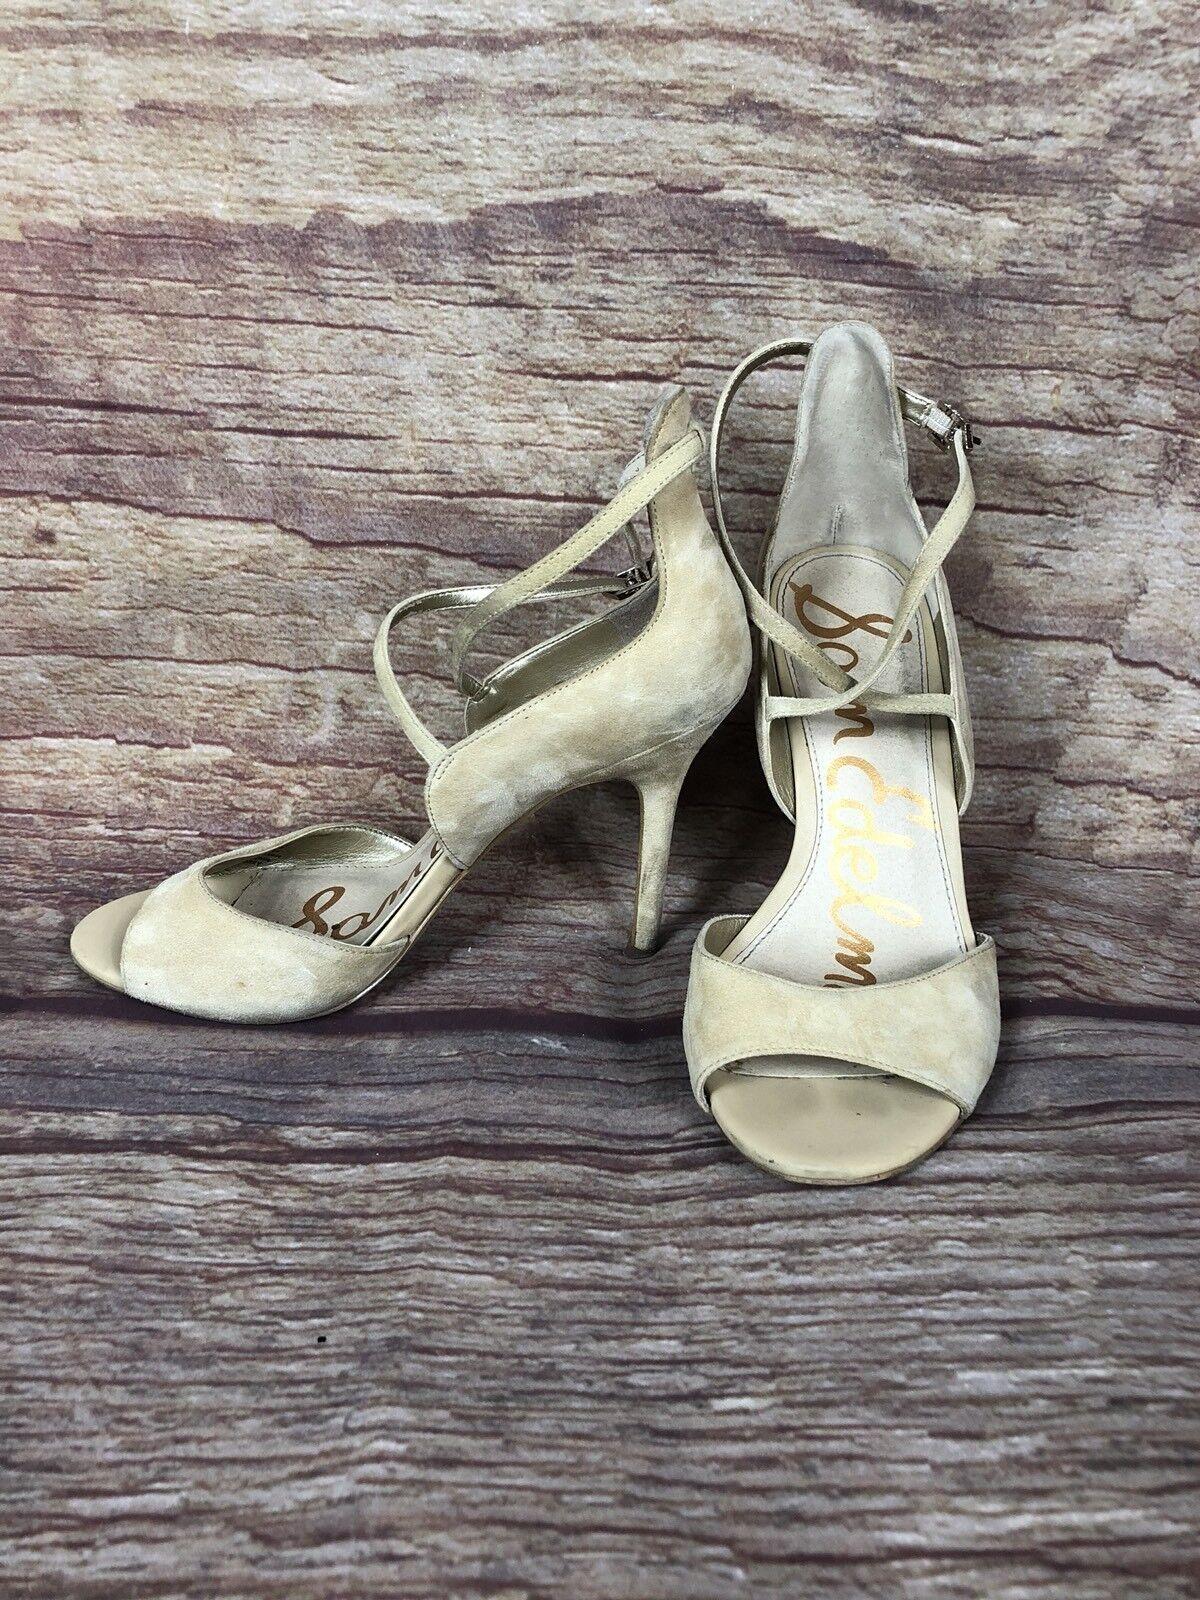 Sam Edelman 7.5 Tan Heels Women Size 7.5 Edelman 4bfe8f